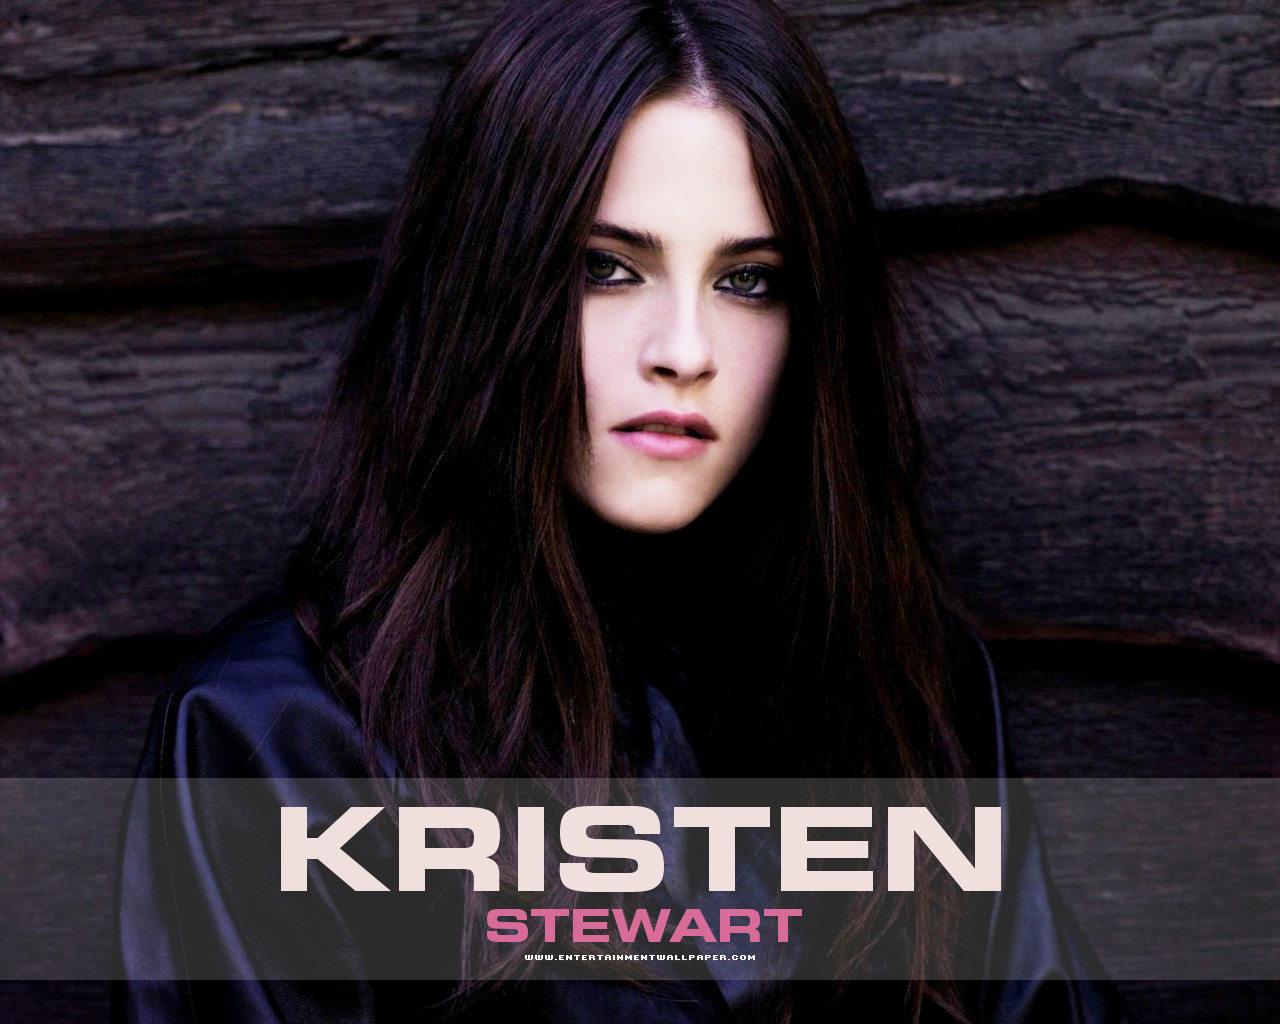 http://4.bp.blogspot.com/-cBcyUFaMdmQ/ToqGfhddhpI/AAAAAAAARMA/MZz6Q4IEKXQ/s1600/Kristen-Stewart_00.jpg